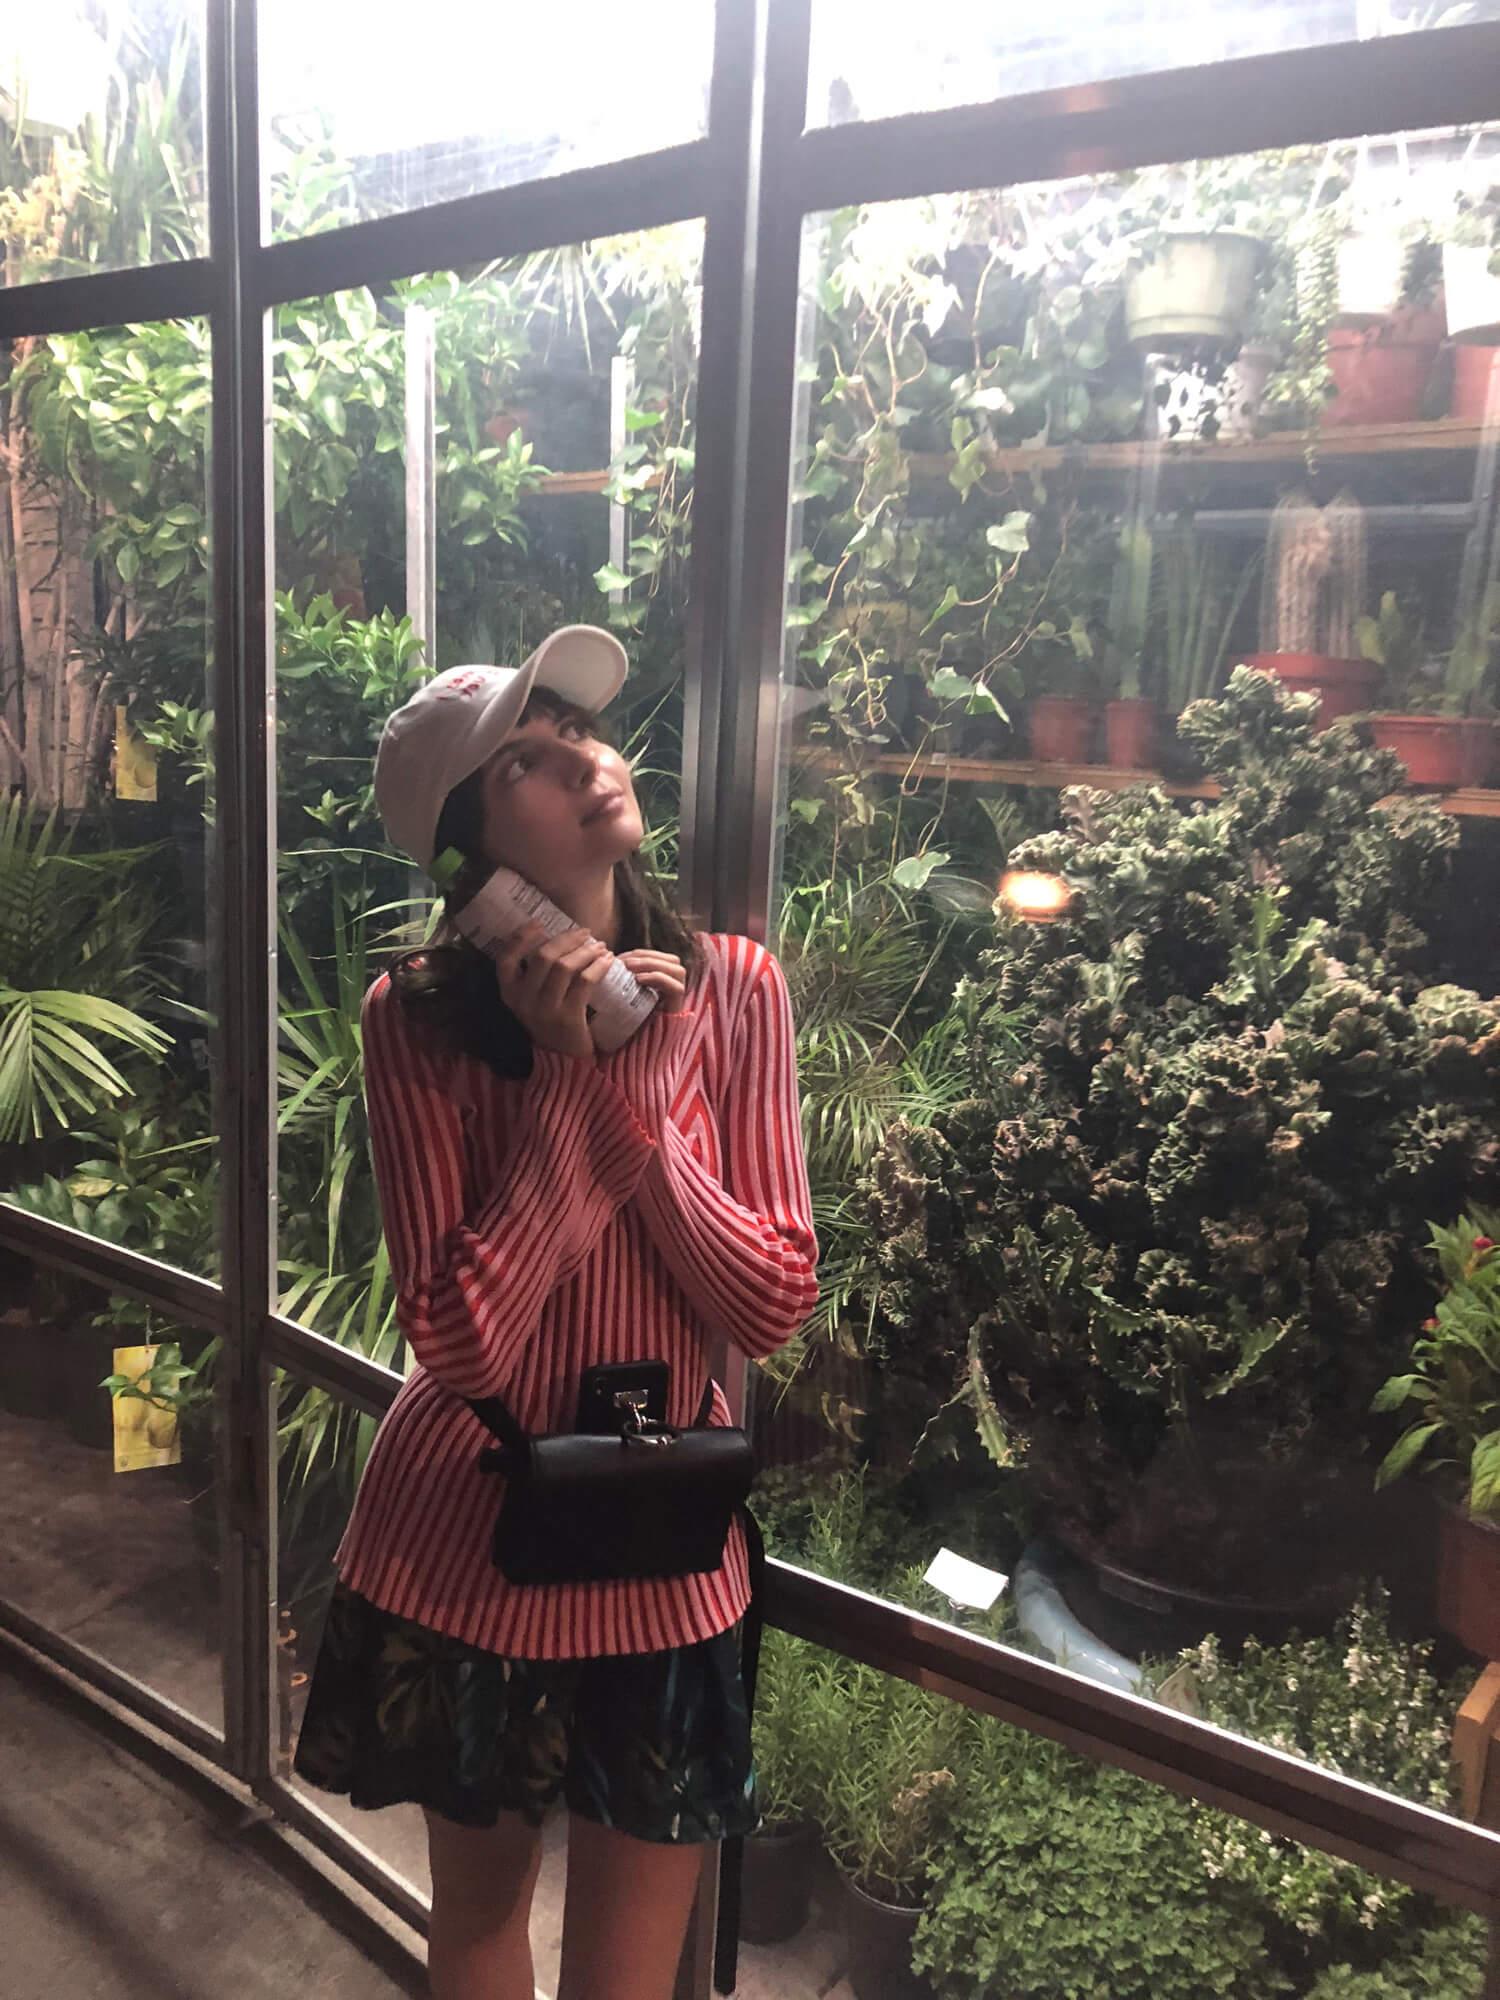 https://liararoux.xxx/wp-content/uploads/2018/10/Liara-Roux-Selfies-and-Snapshots-September-2018-046.jpg